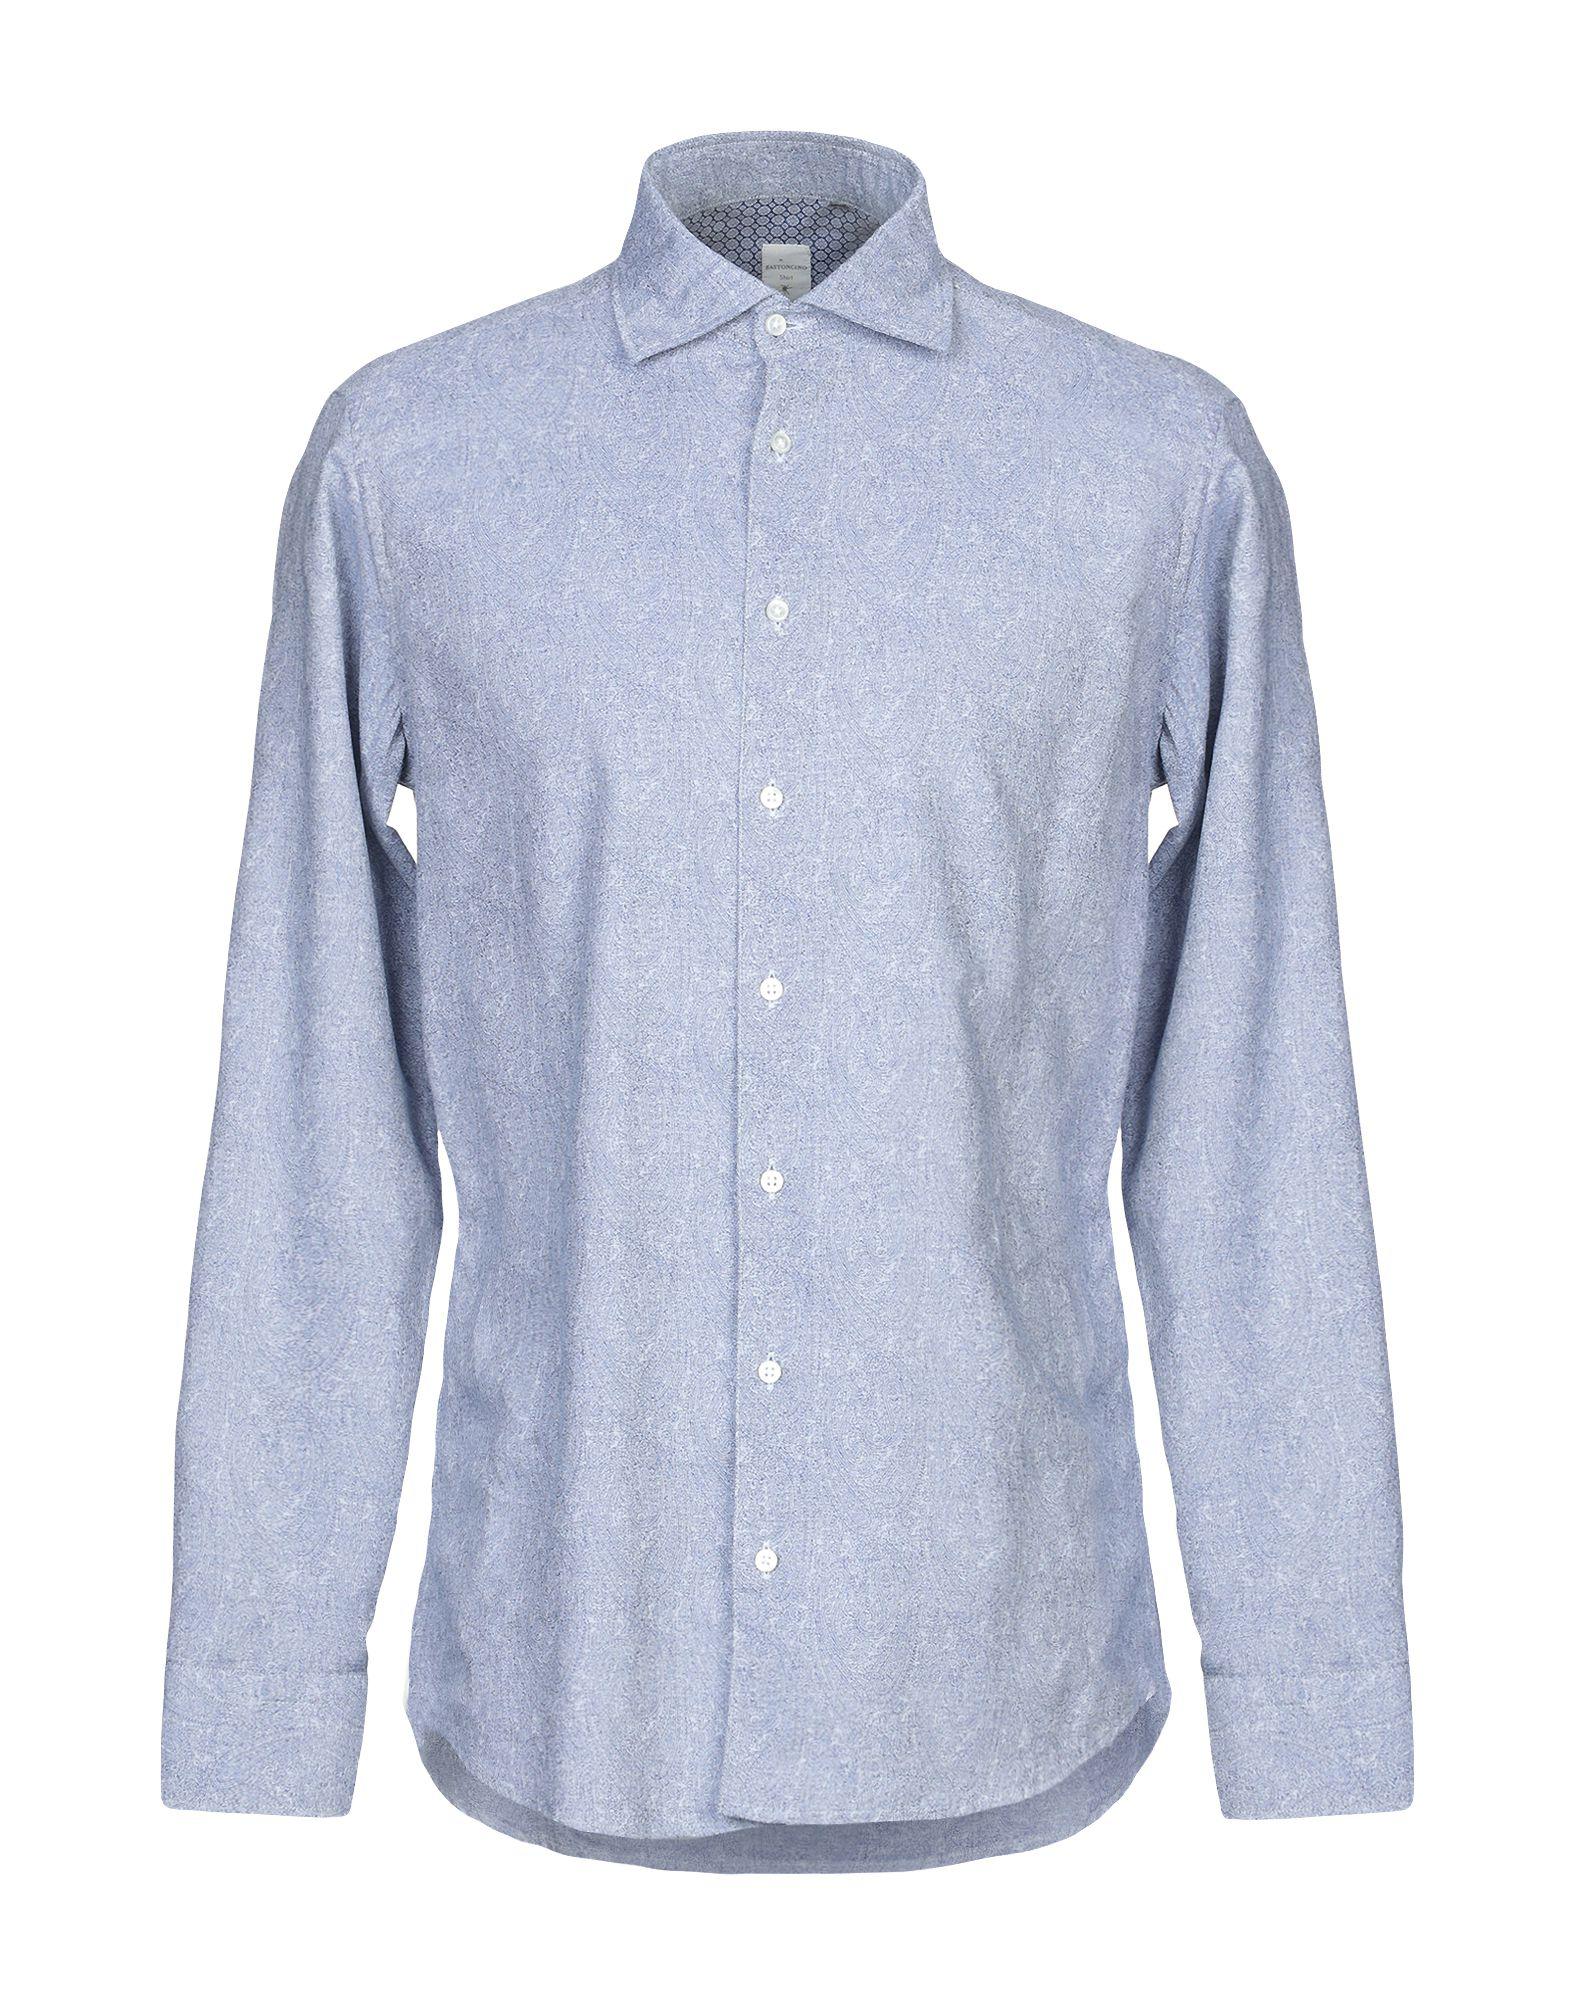 Camicia Fantasia Bastoncino uomo uomo - 38798595TO  Alles in hoher Qualität und günstigem Preis